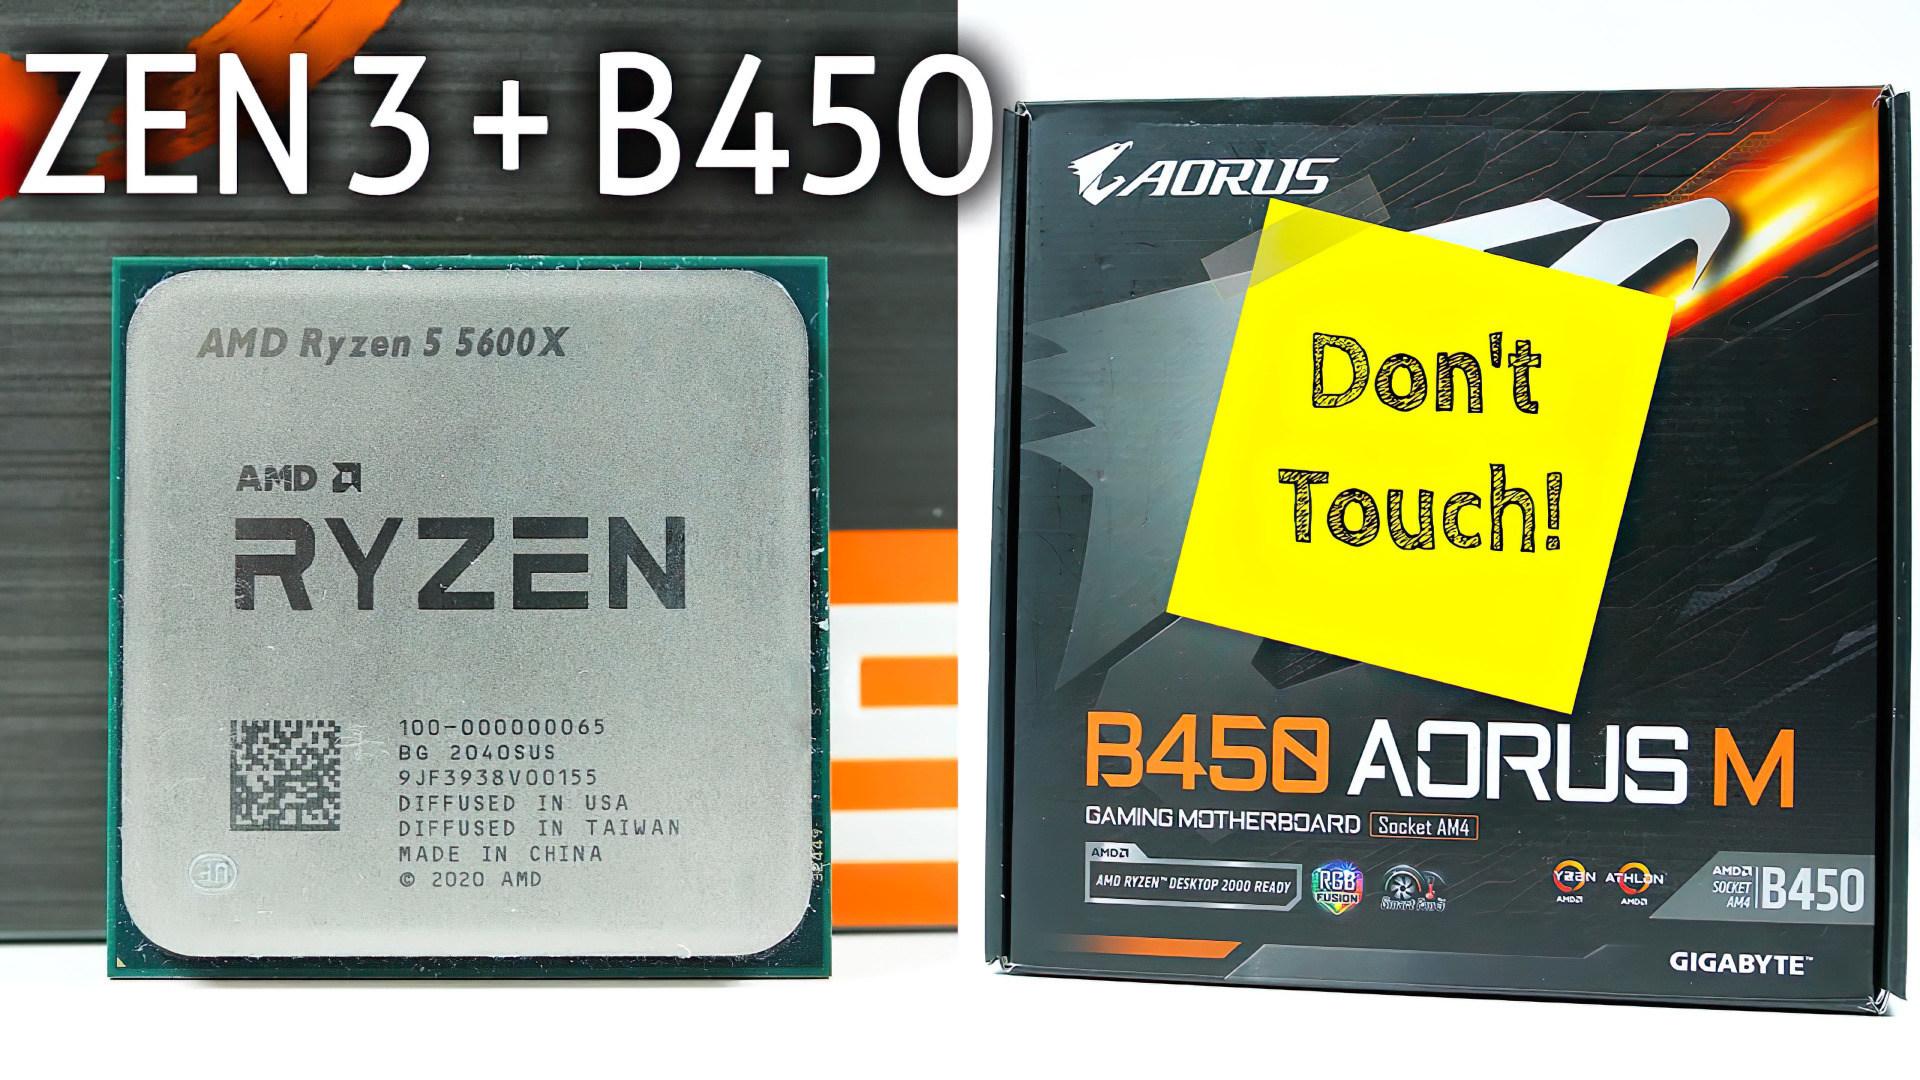 Prozessor, Cpu, Test, Amd, Asus, Ryzen, Vergleich, Zenchilli, Zenchillis Hardware Reviews, Gigabyte, Msi, Zen 3, B450, B550, X470, Ryzen 5600X